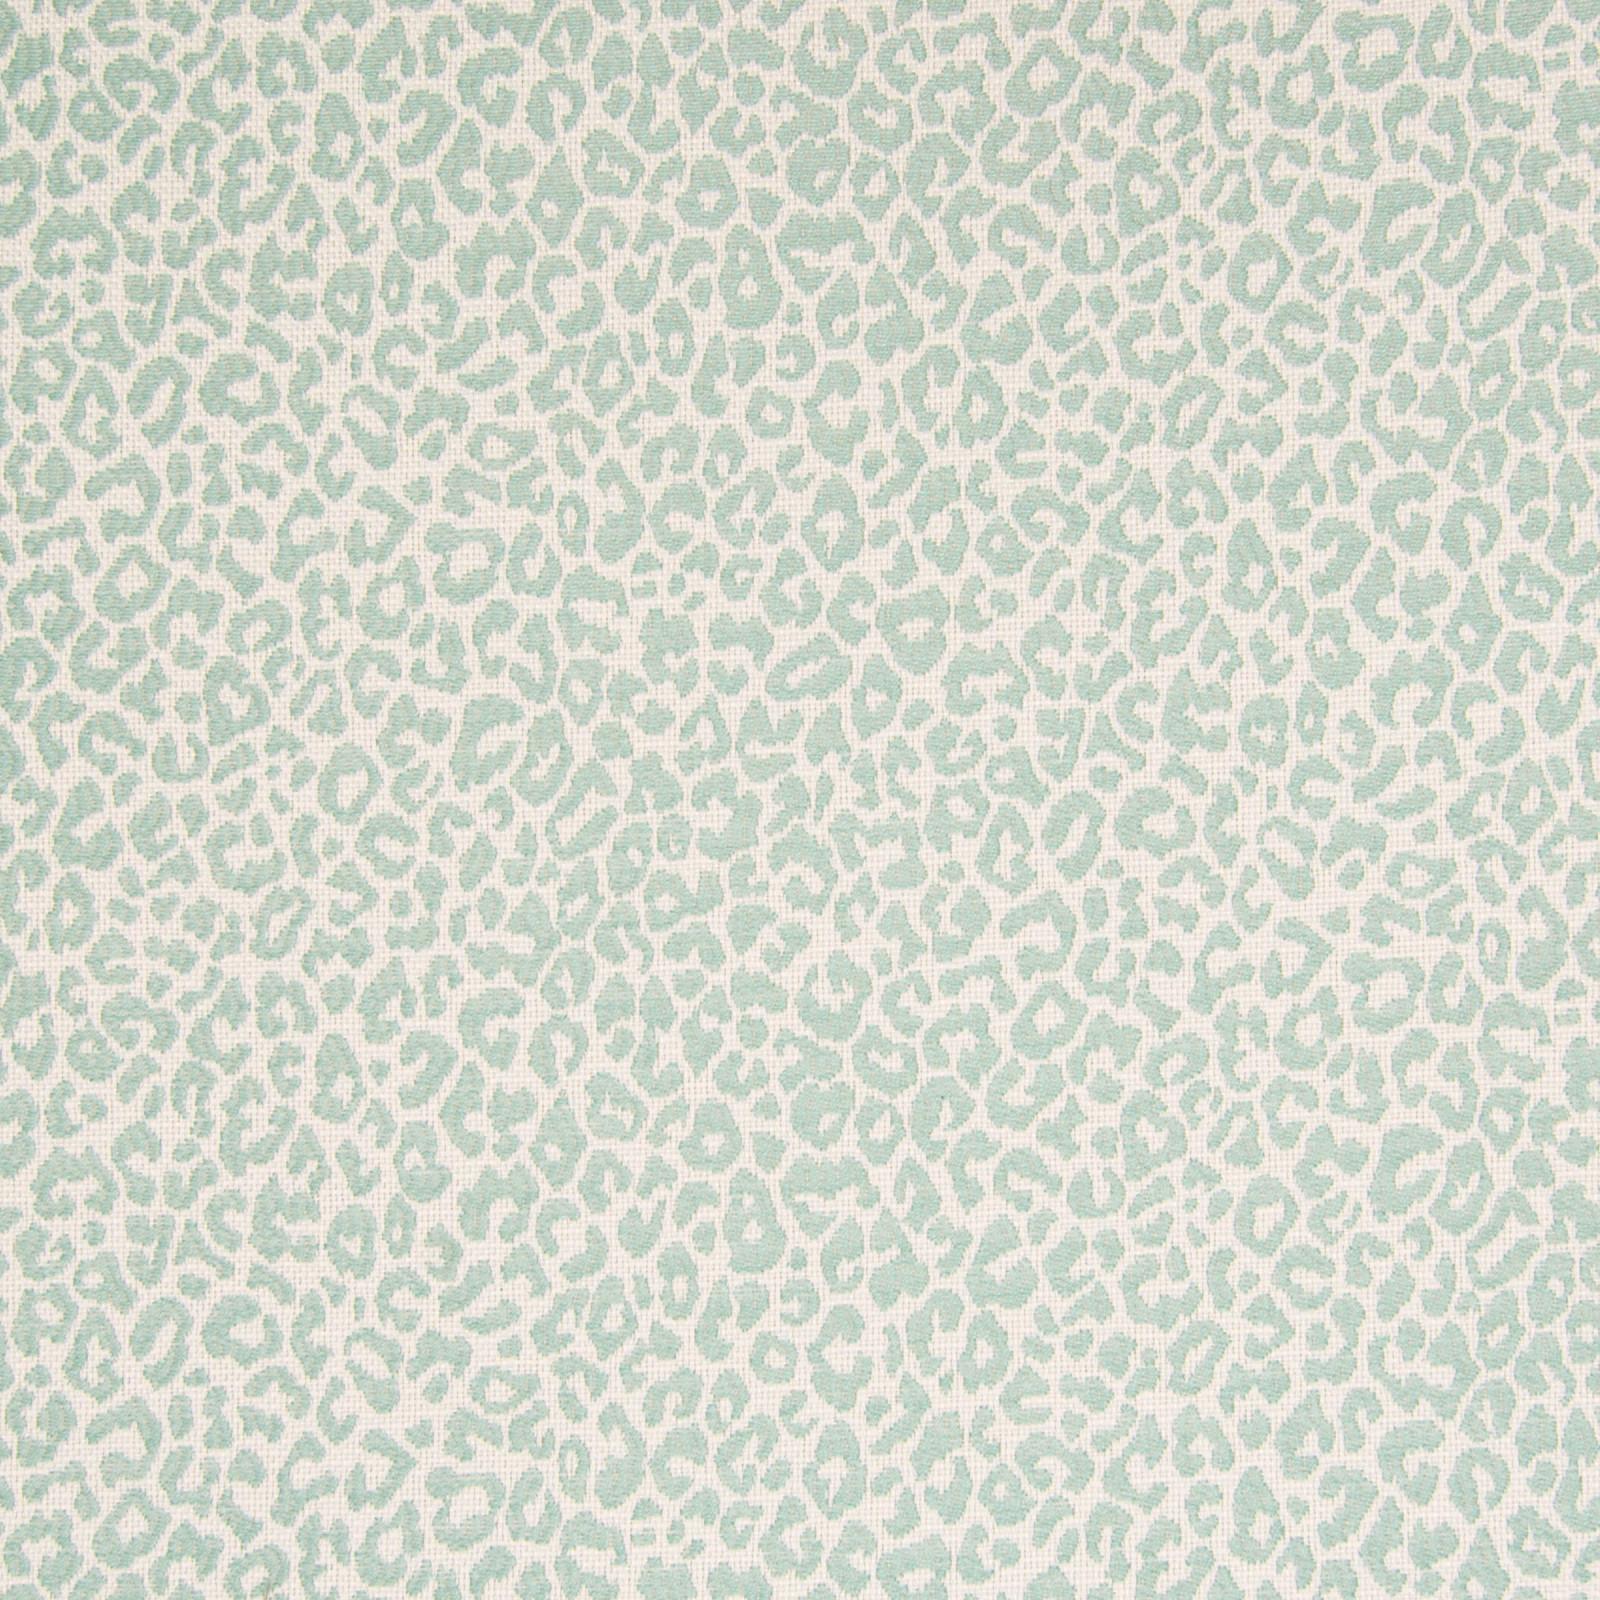 B7600 Mist Greenhouse Fabrics